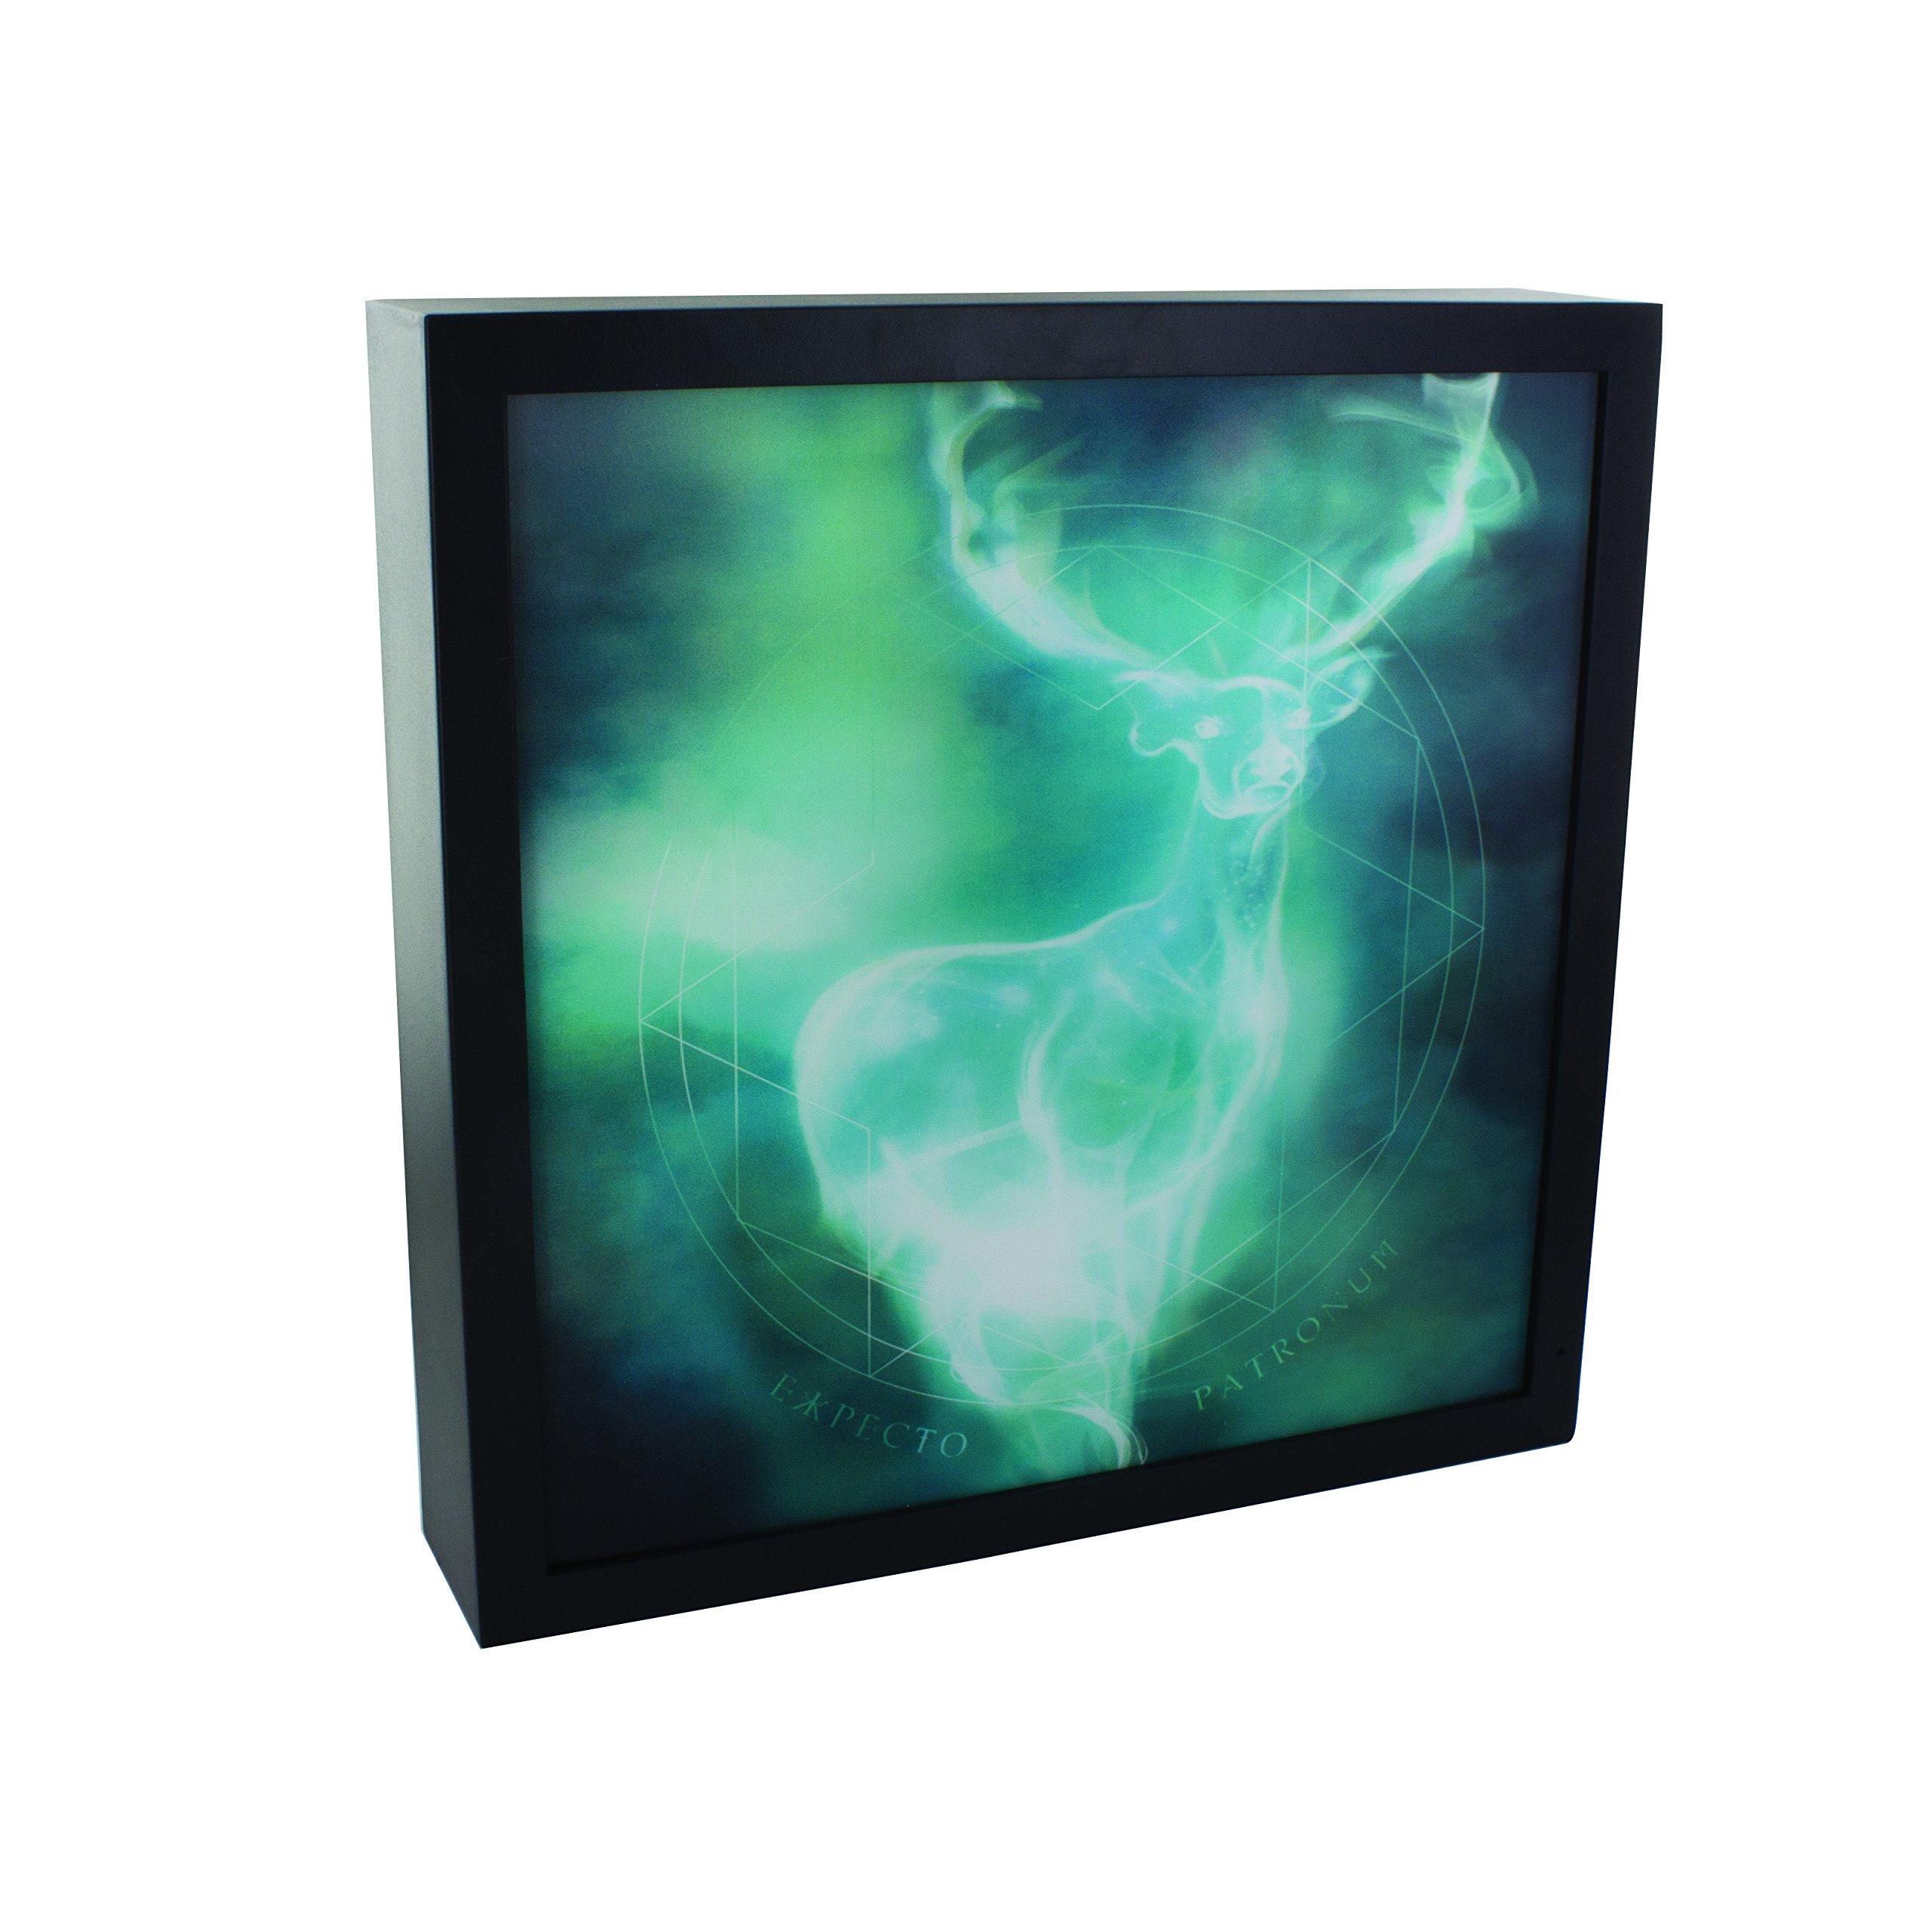 Patronus 3D Luminart - Wall Art - Harry Potter Officially Licensed Product